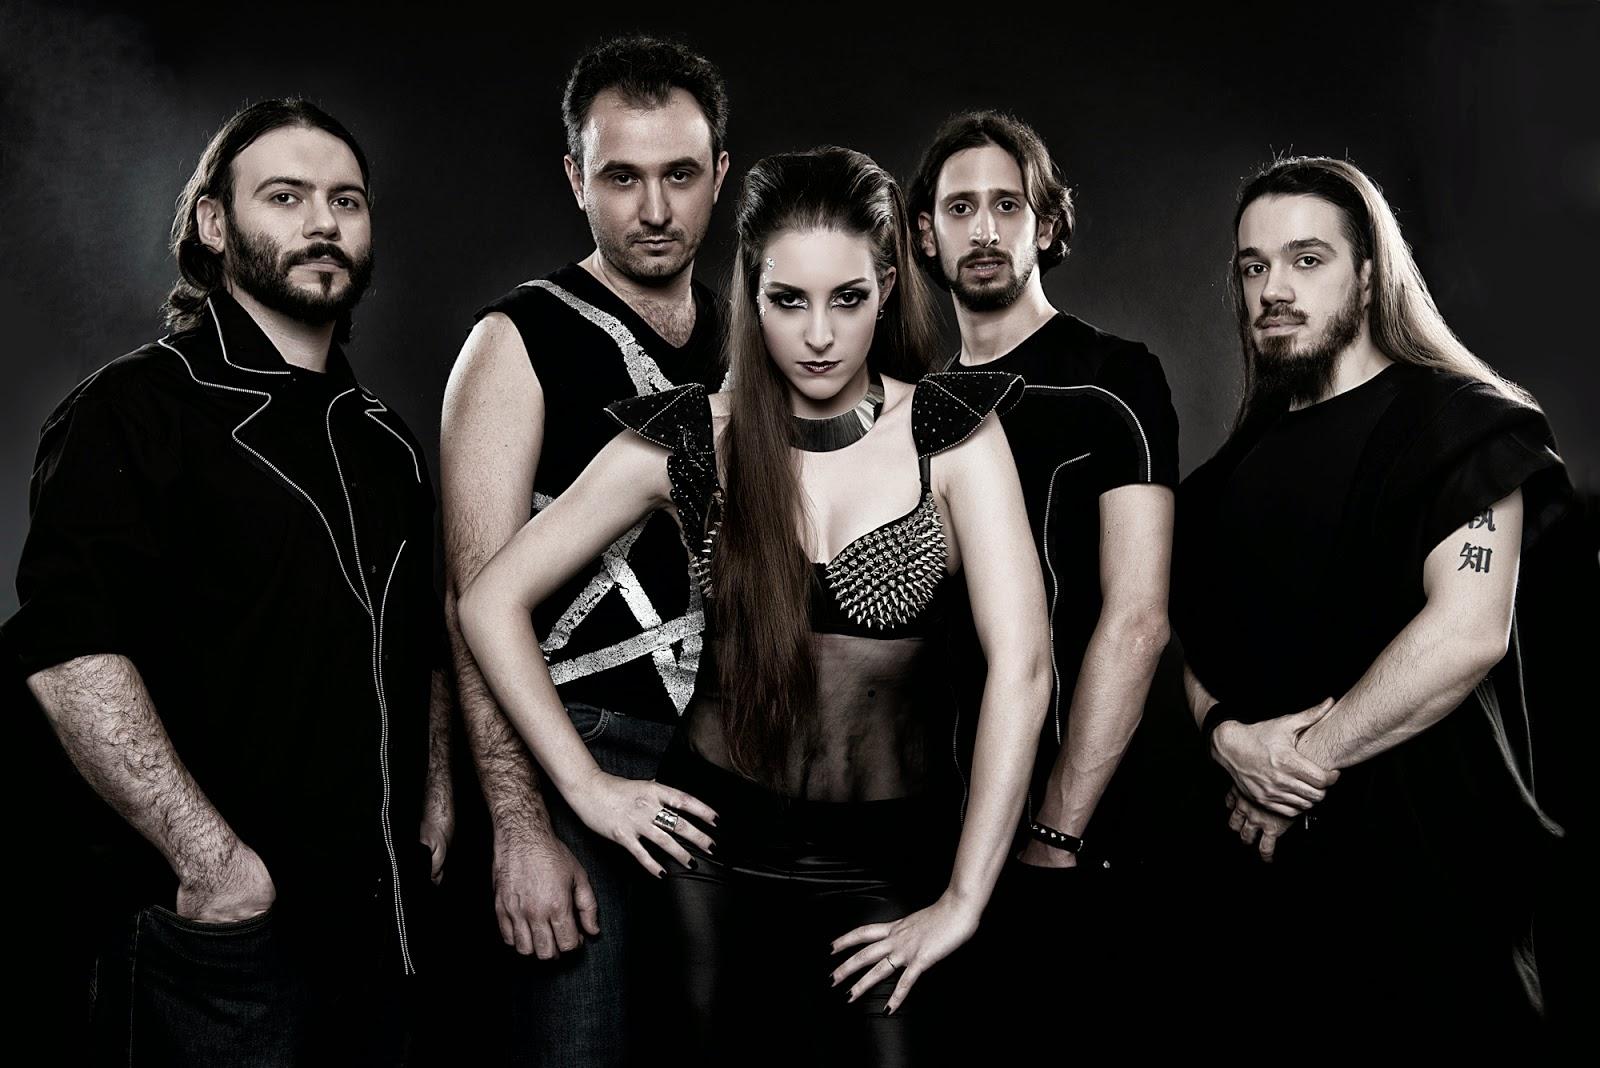 Temperance concert in Innsbruck